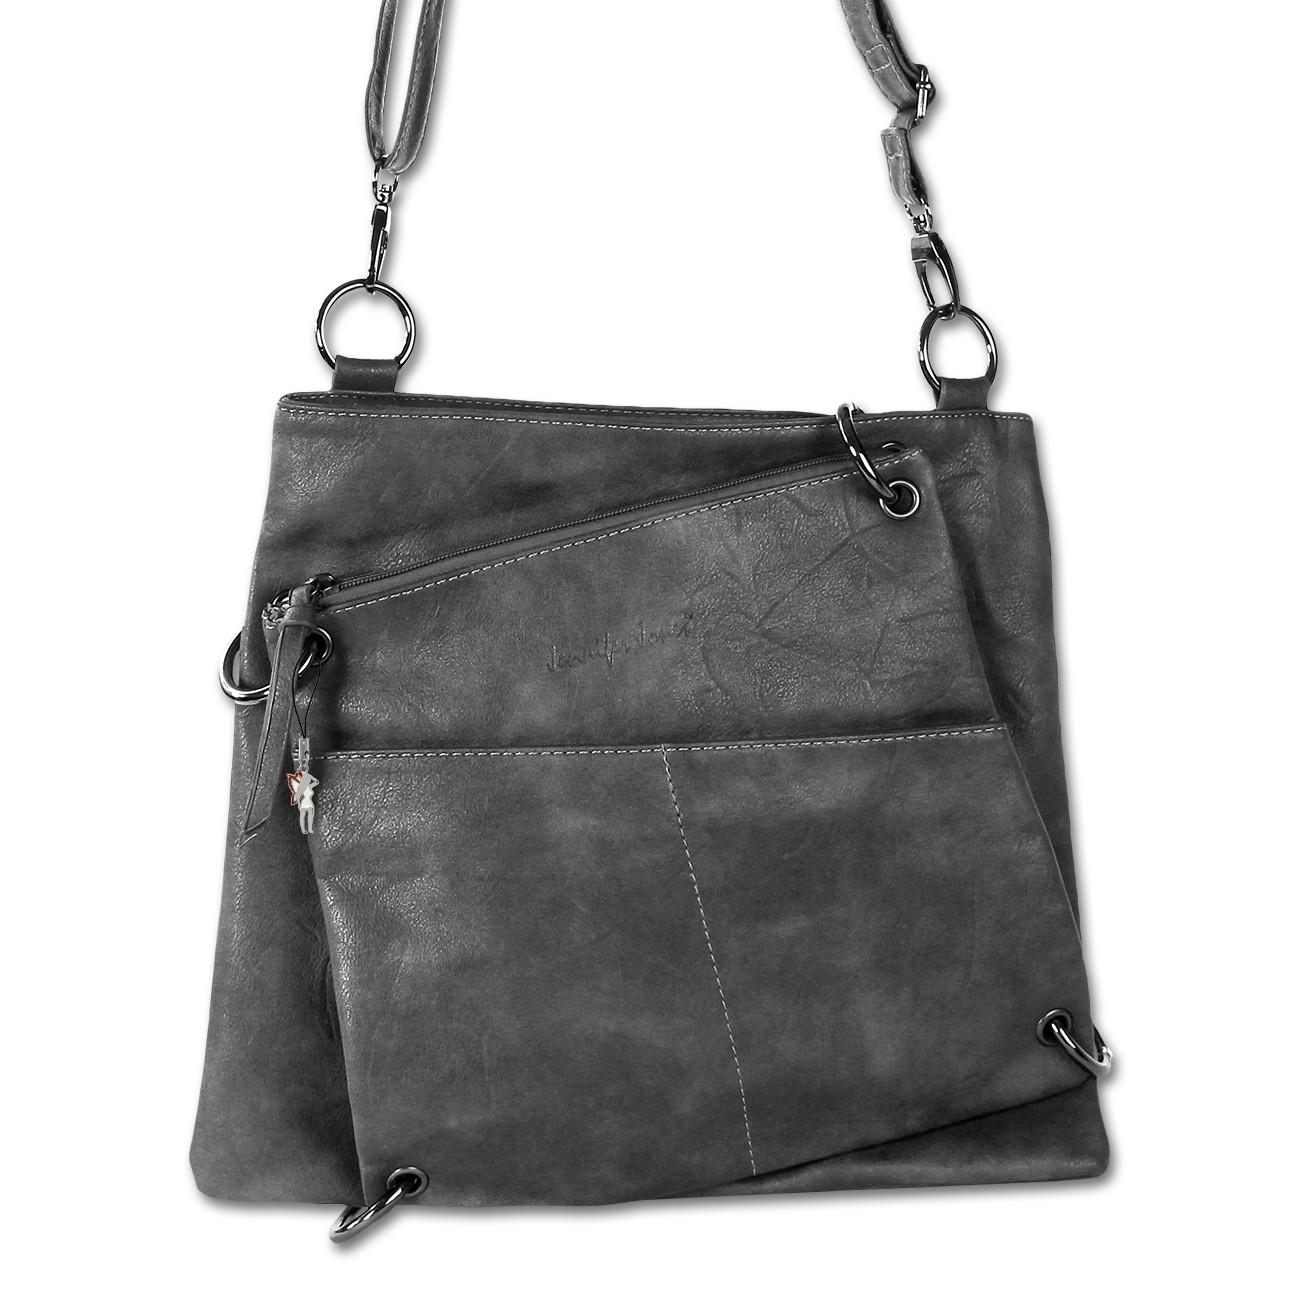 Umhängetasche Abendtasche Kunstleder grau Damentasche Jennifer Jones OTJ138K